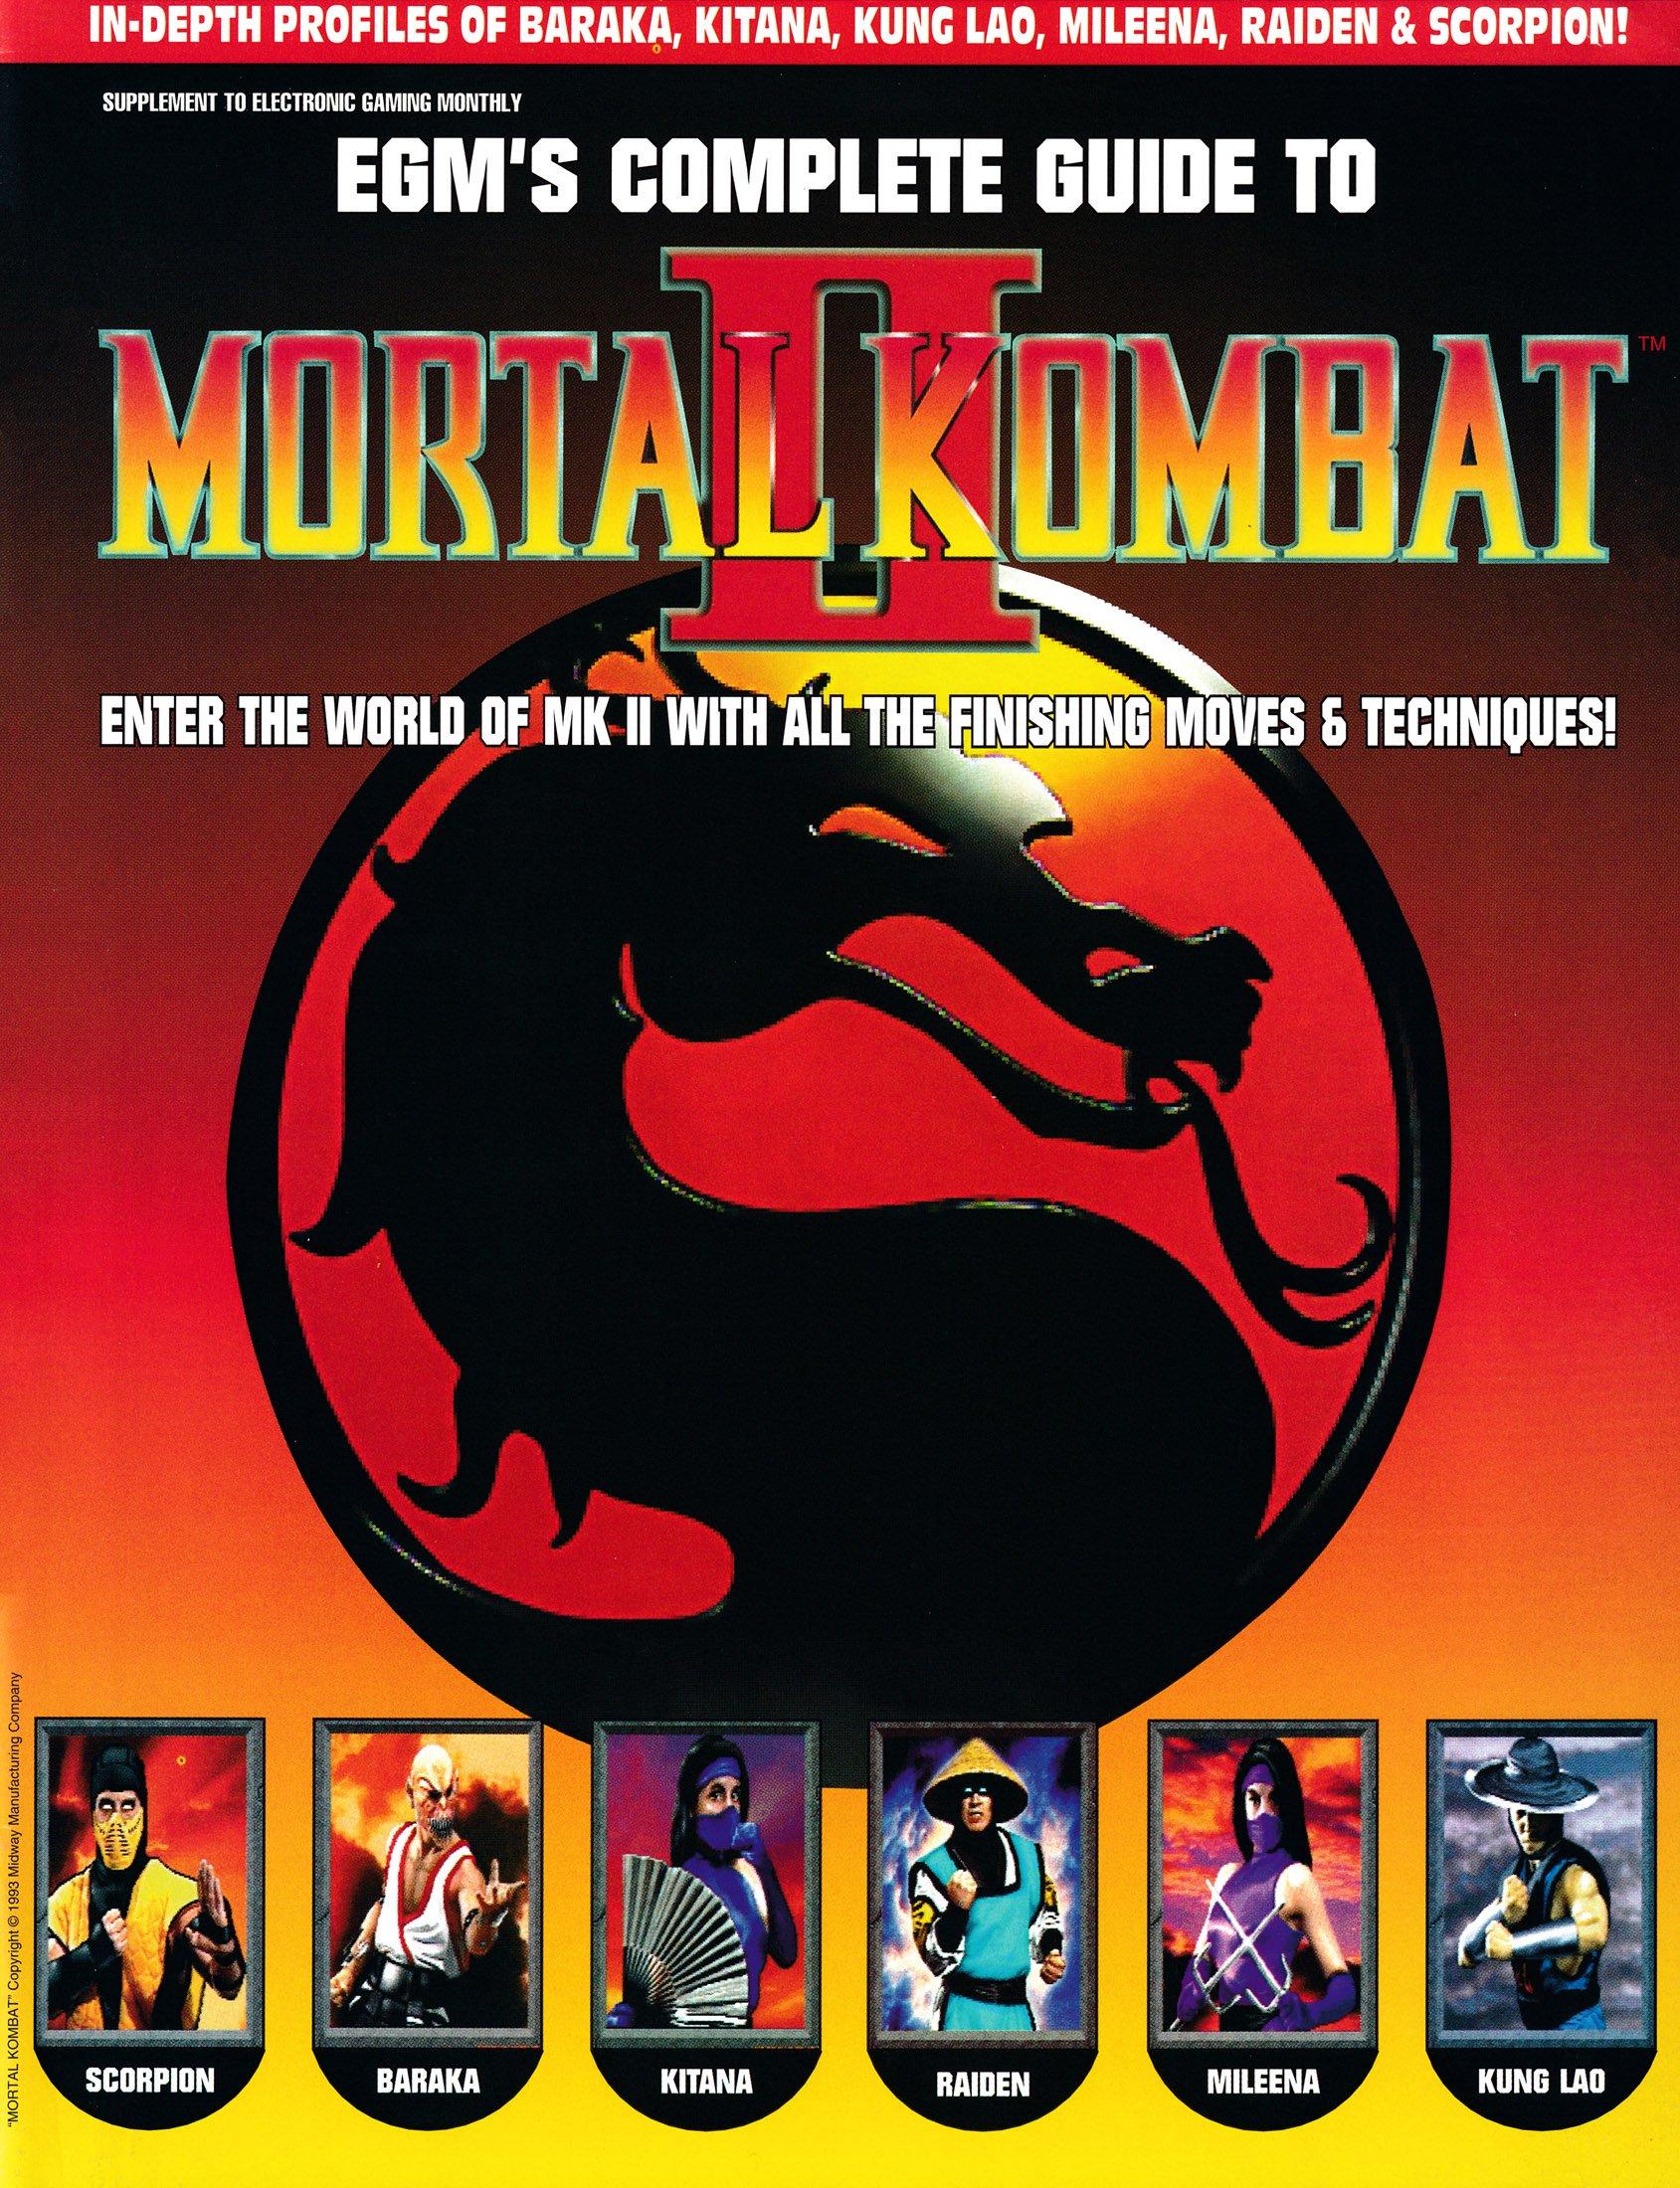 EGM's Complete Guide to Mortal Kombat II